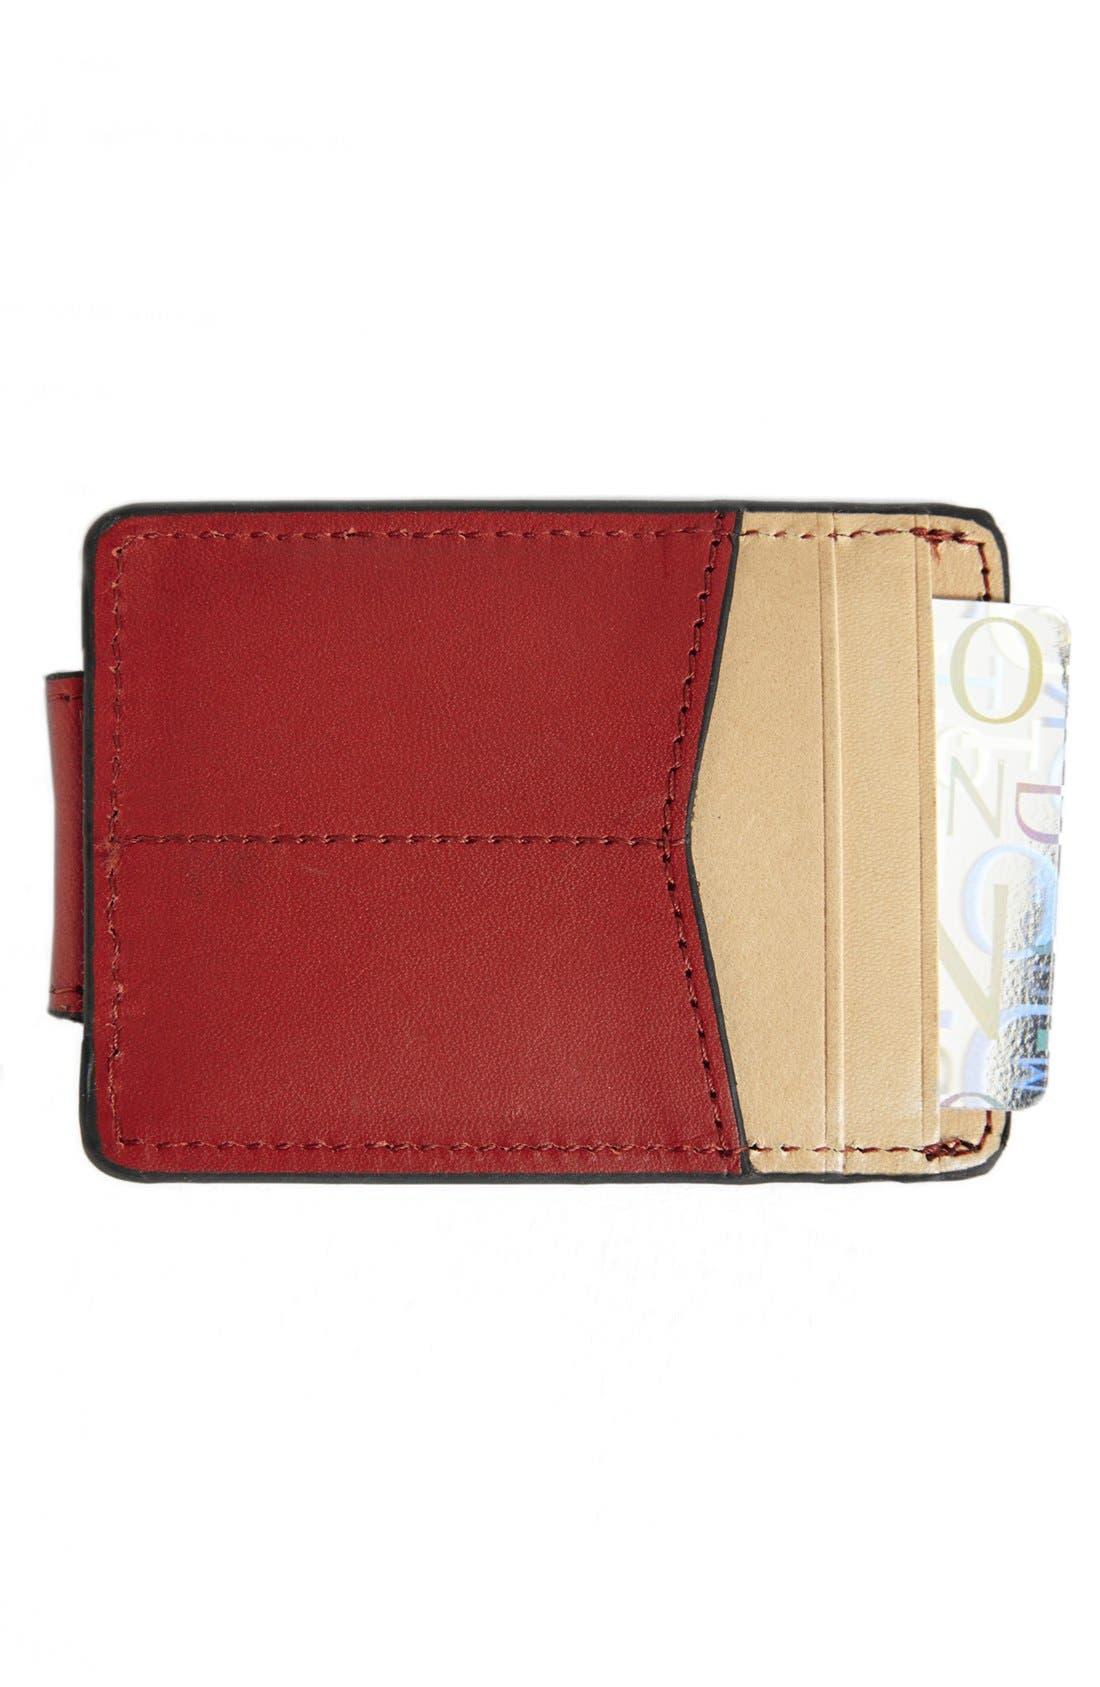 Main Image - J. Fold 'Thunderbird' Money Clip Wallet